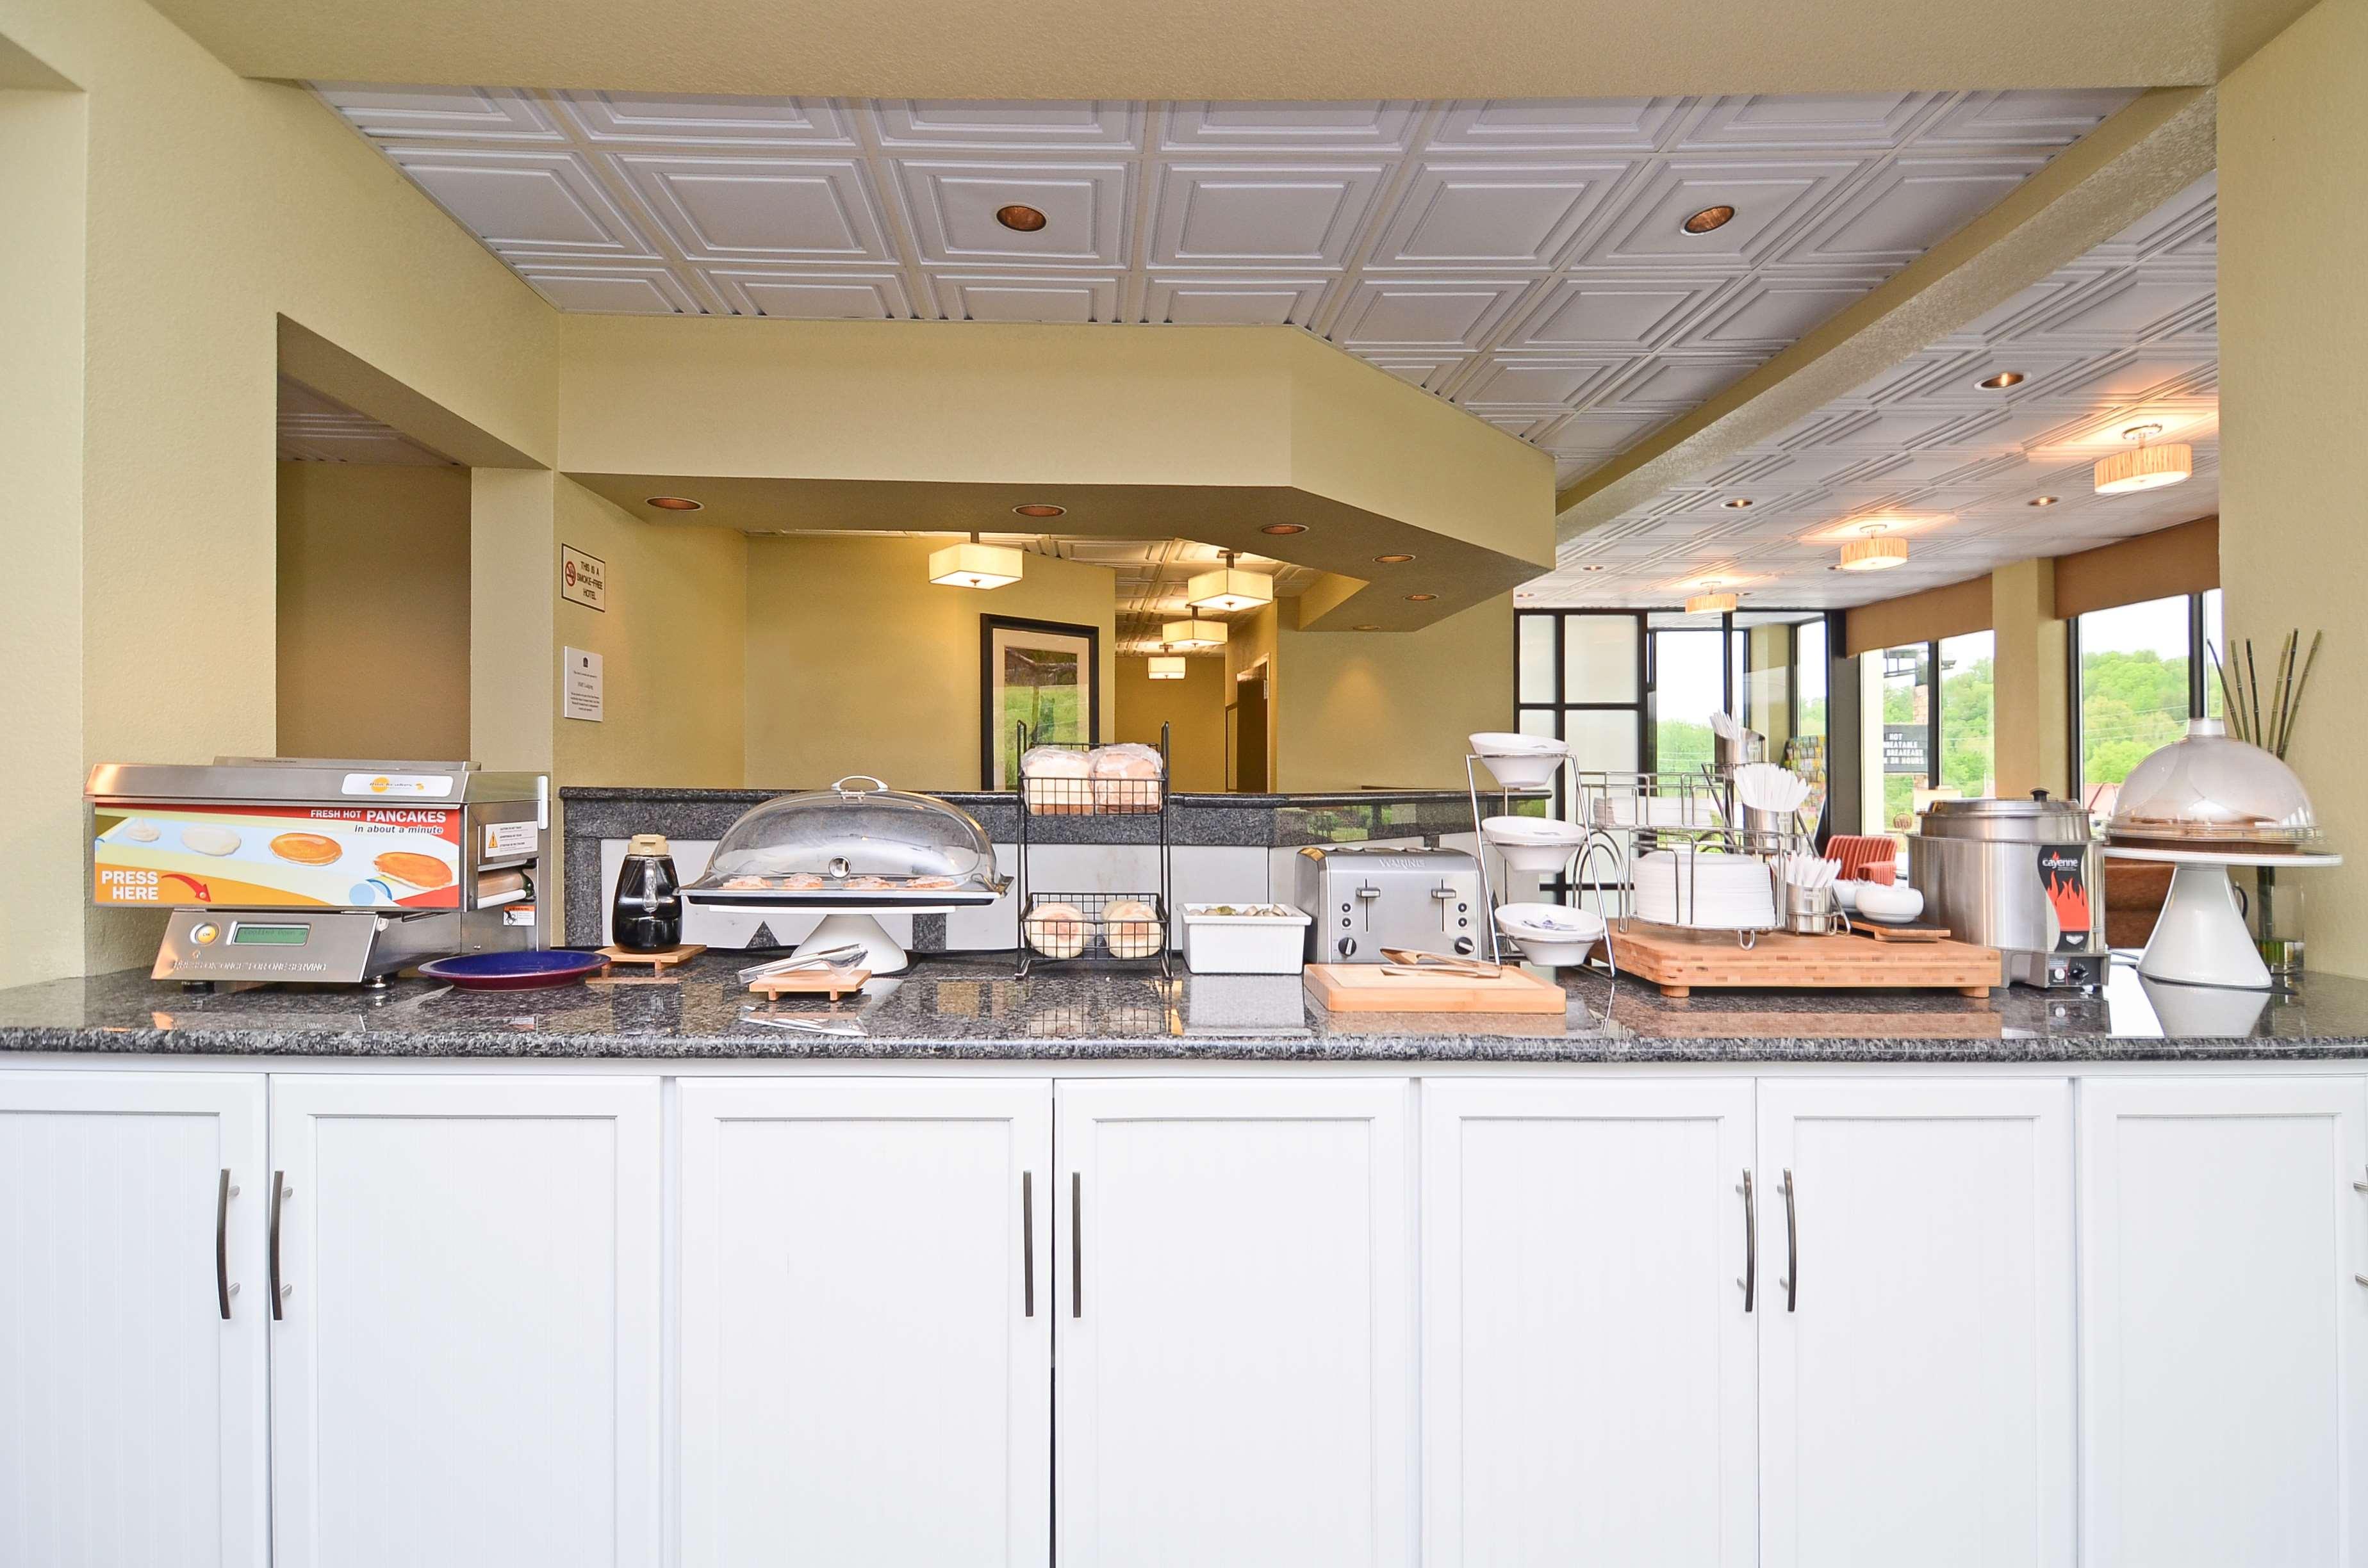 Best Western Cades Cove Inn image 4